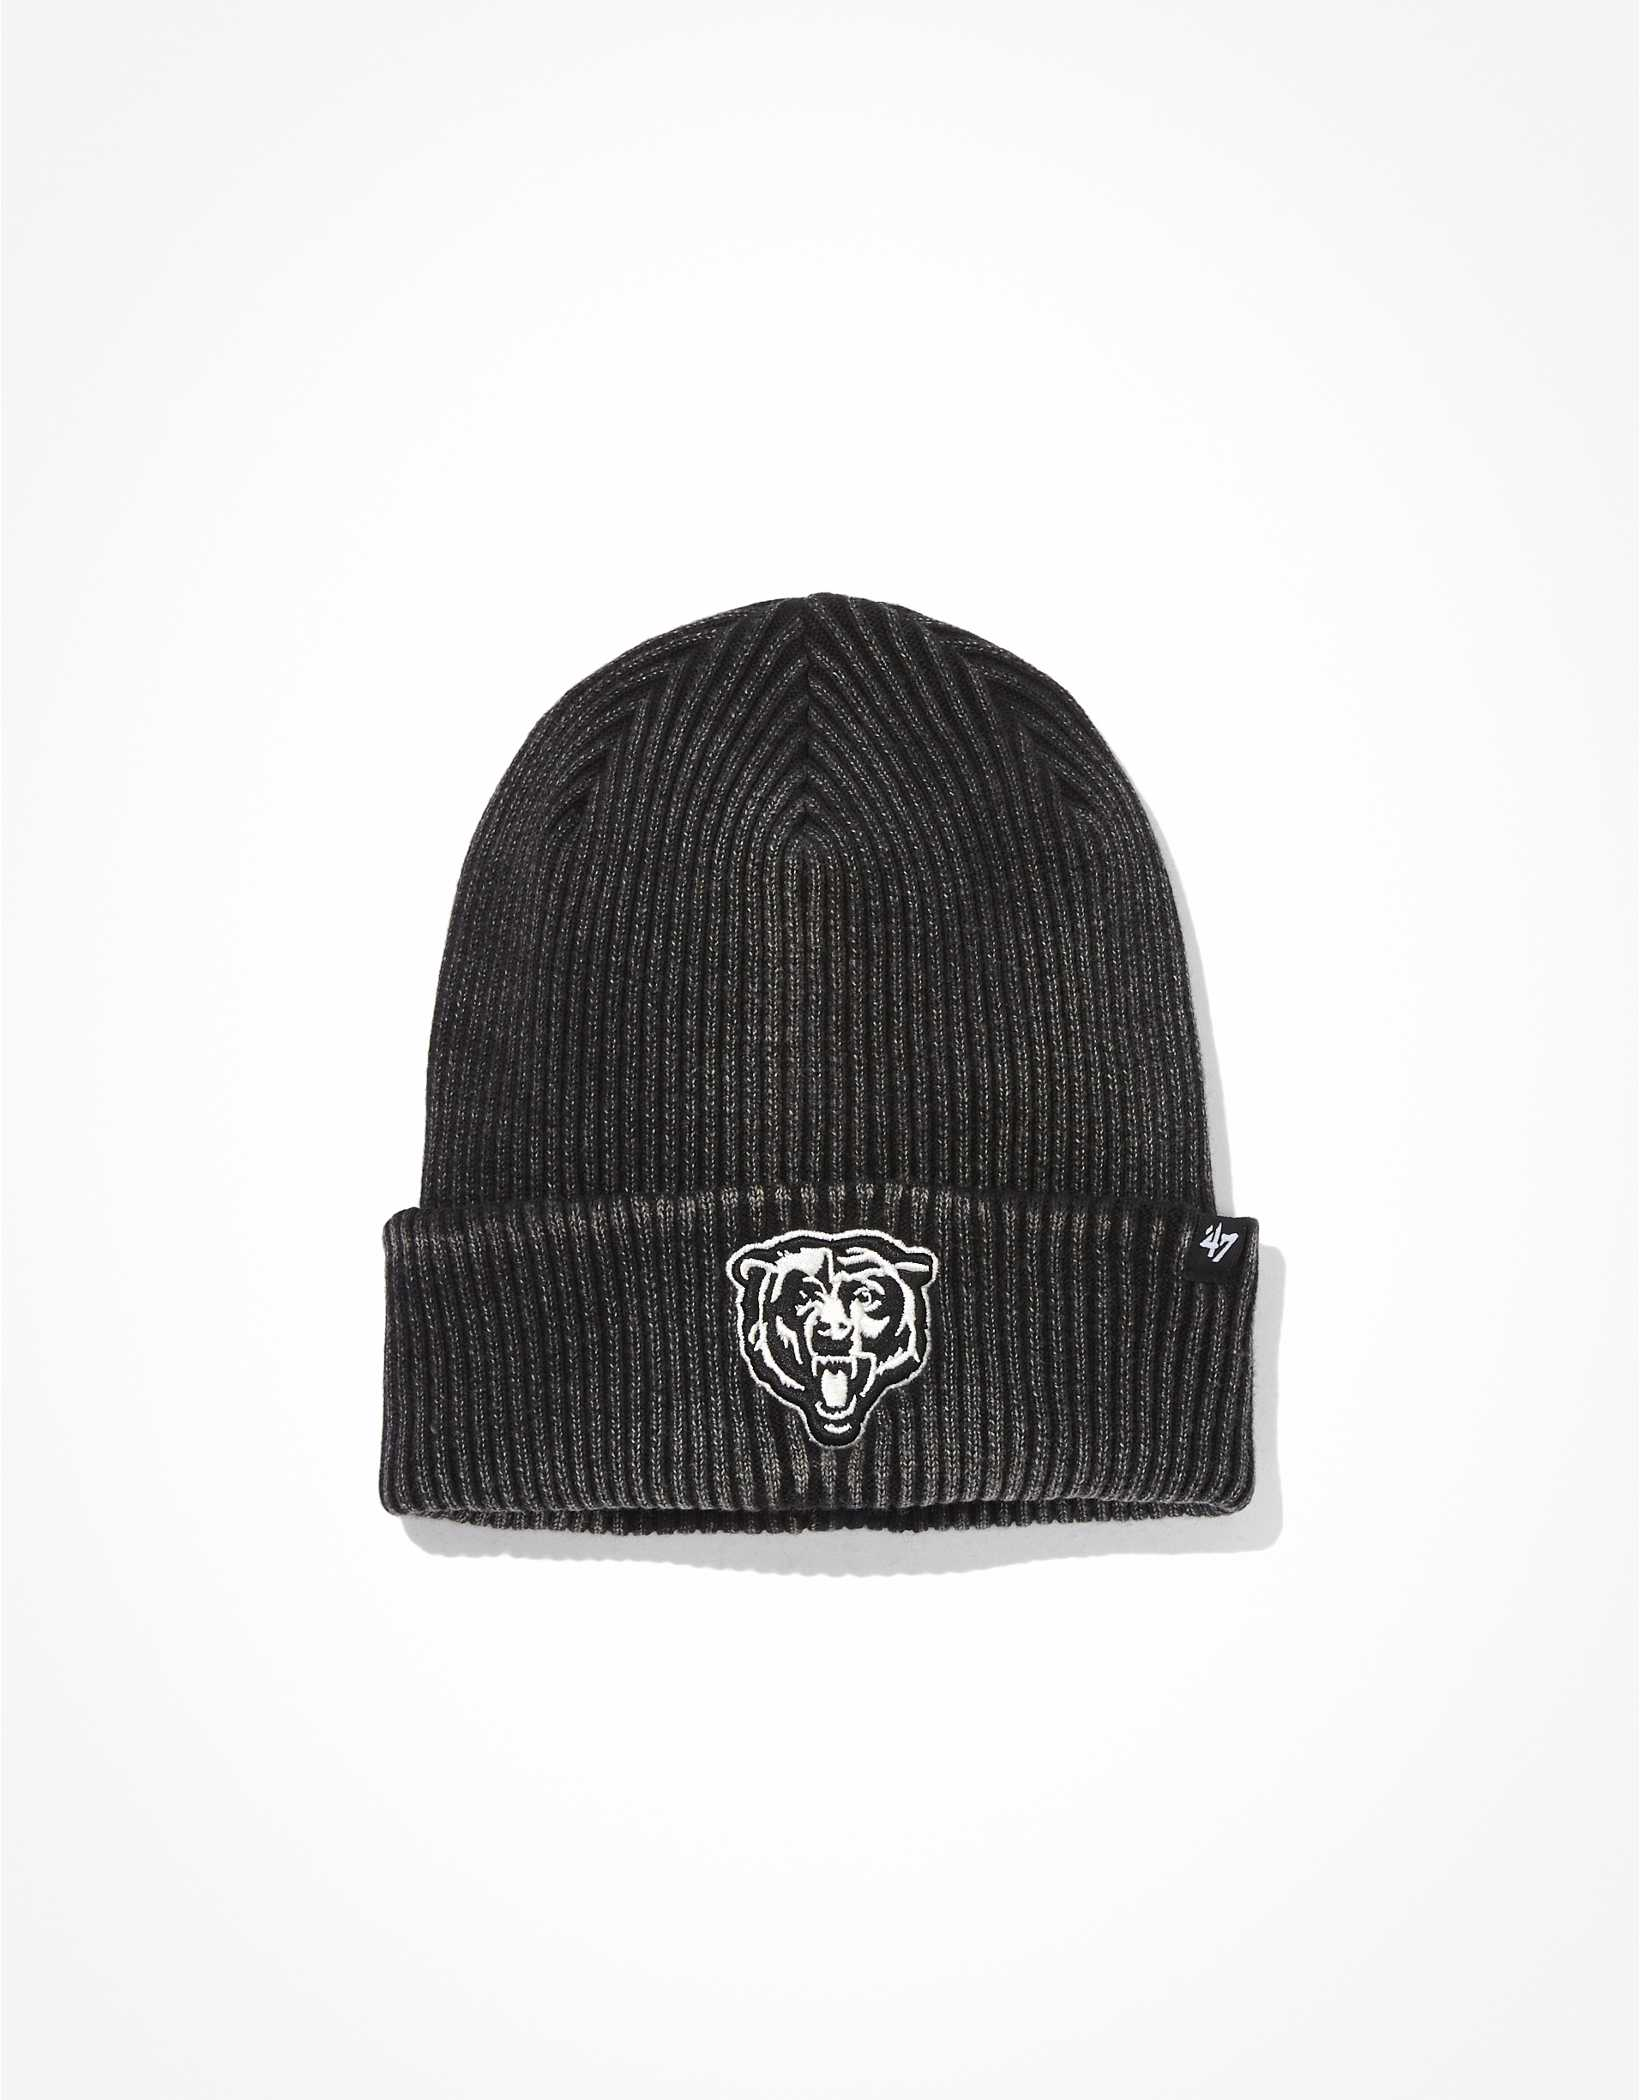 '47 Chicago Bears Knit Beanie